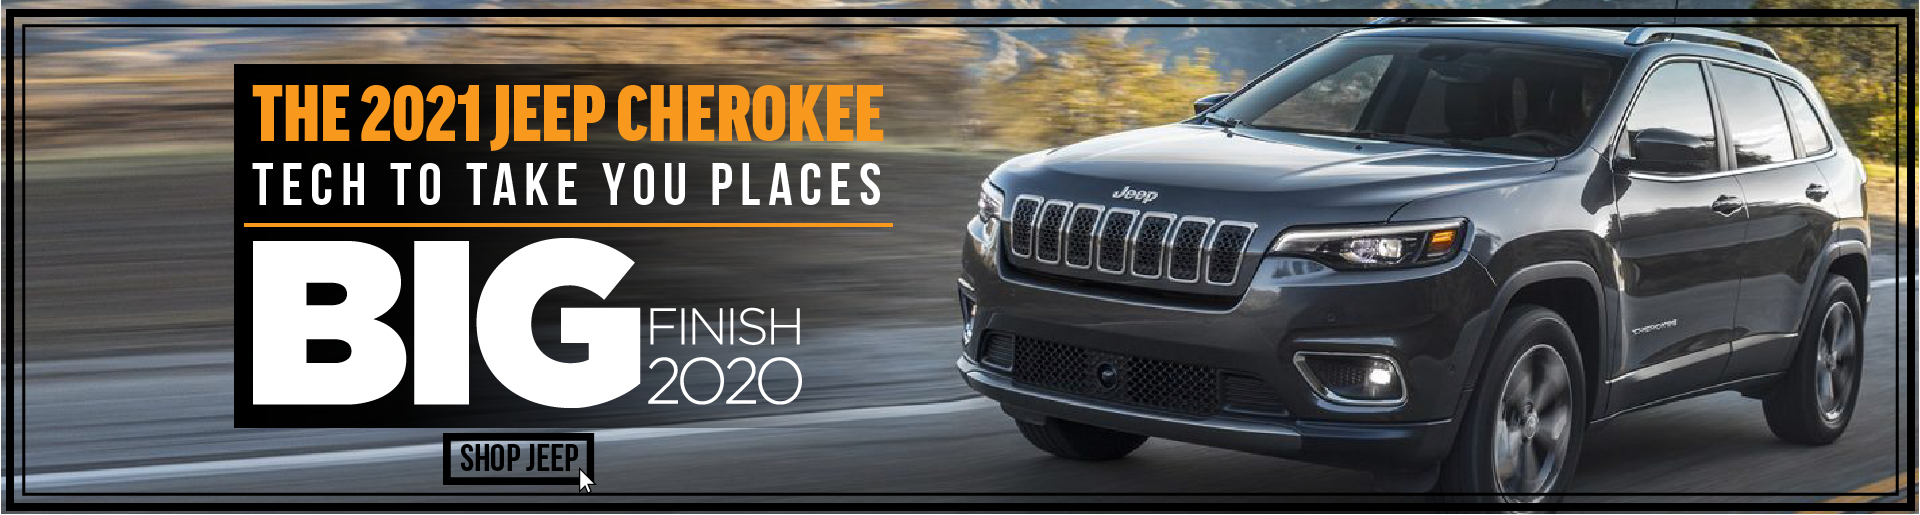 2021 Jeep Cherokee Generic- December 2020